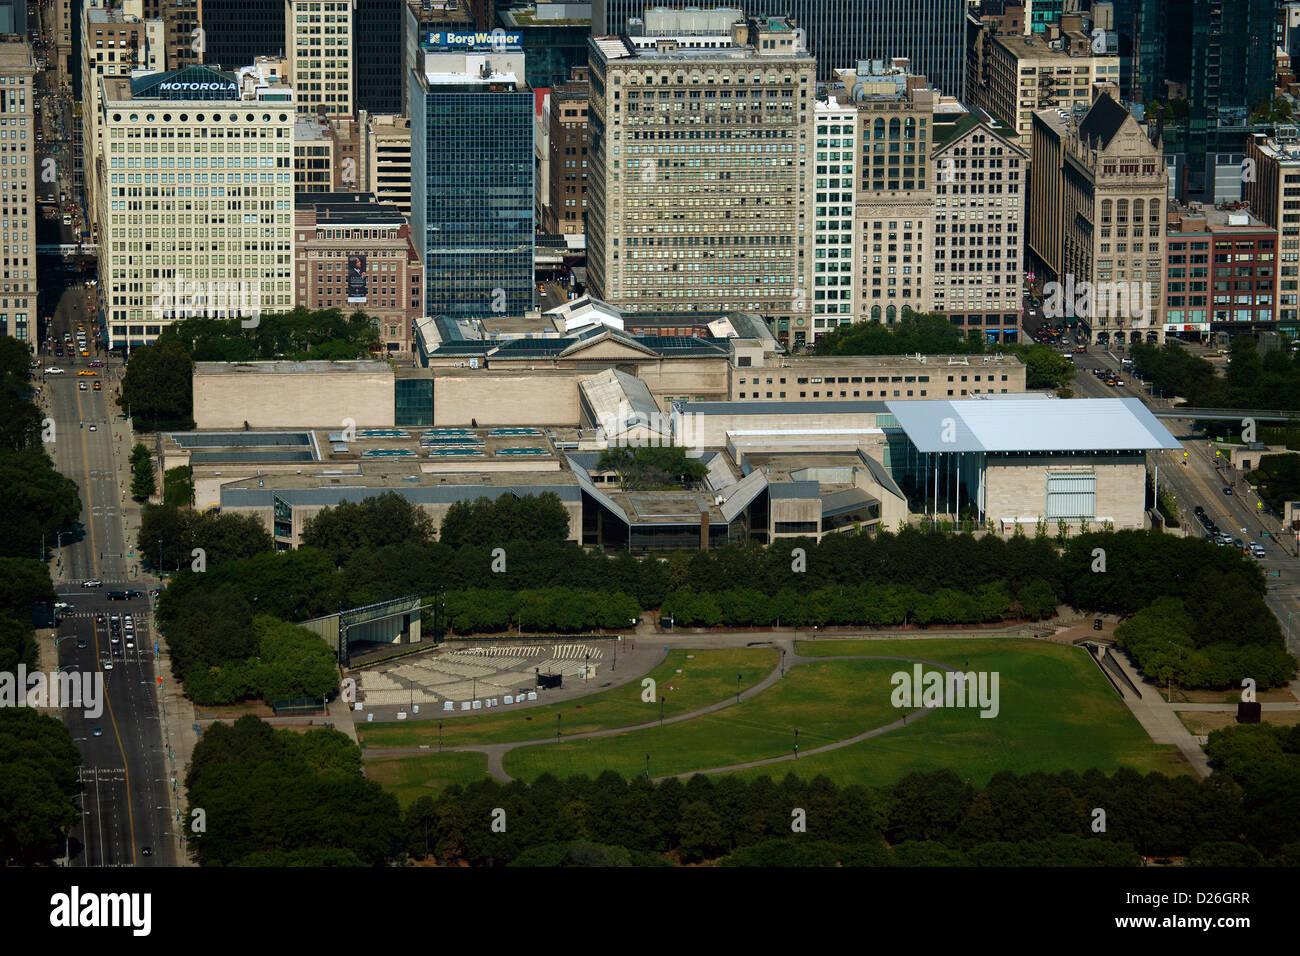 aerial photograph James C. Petrillo Music Shell, Art Institute, Grant Park, Chicago, Illinois - Stock Image